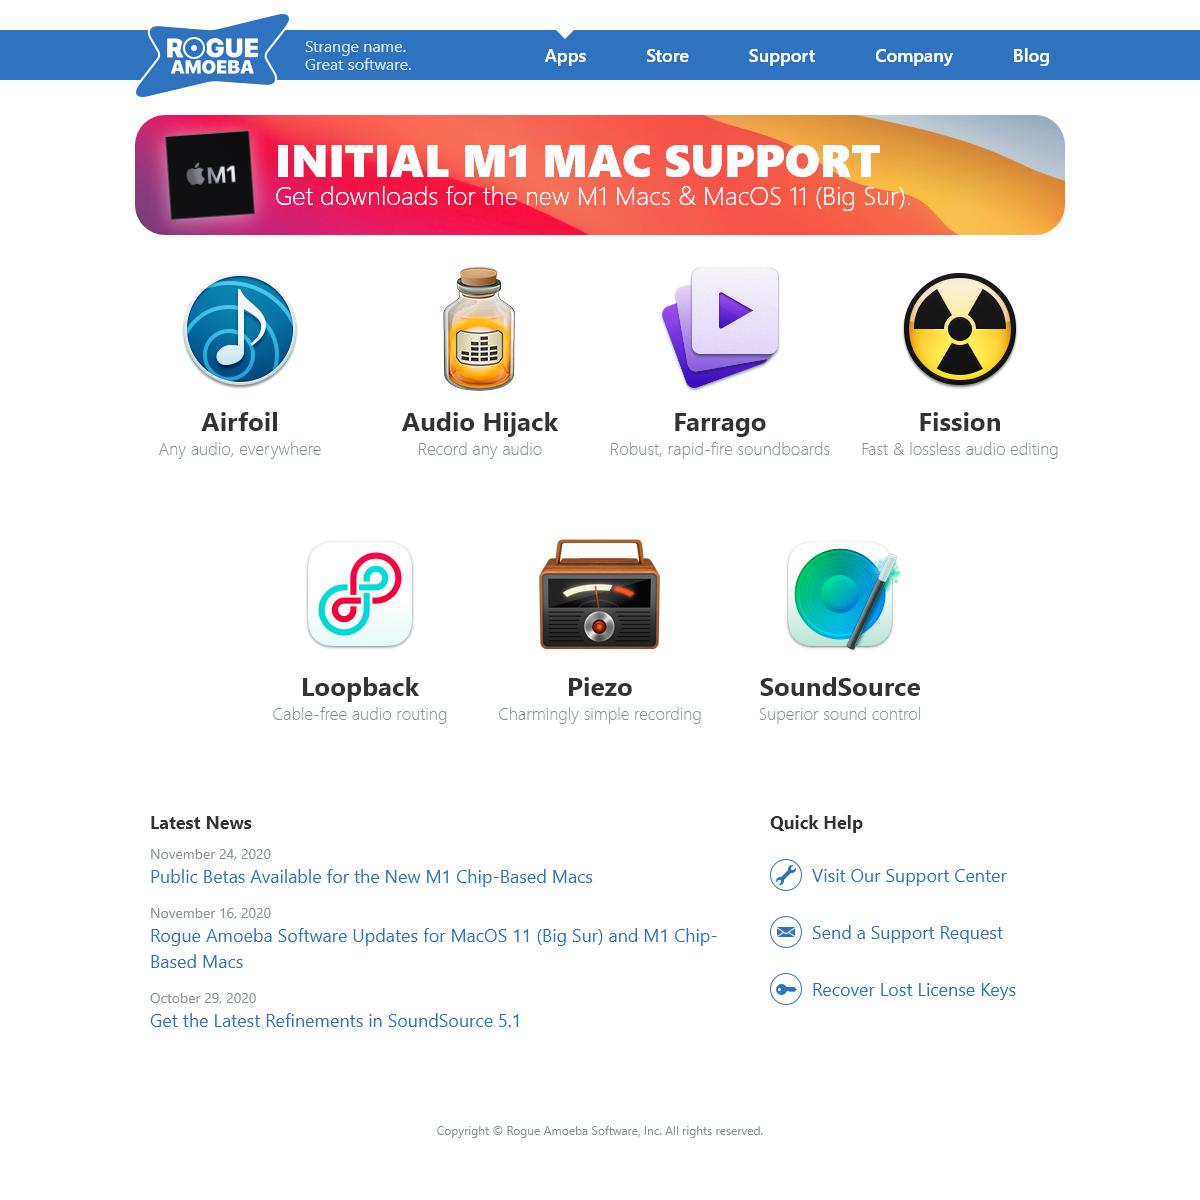 Rogue Amoeba - Quality Audio Software for MacOS